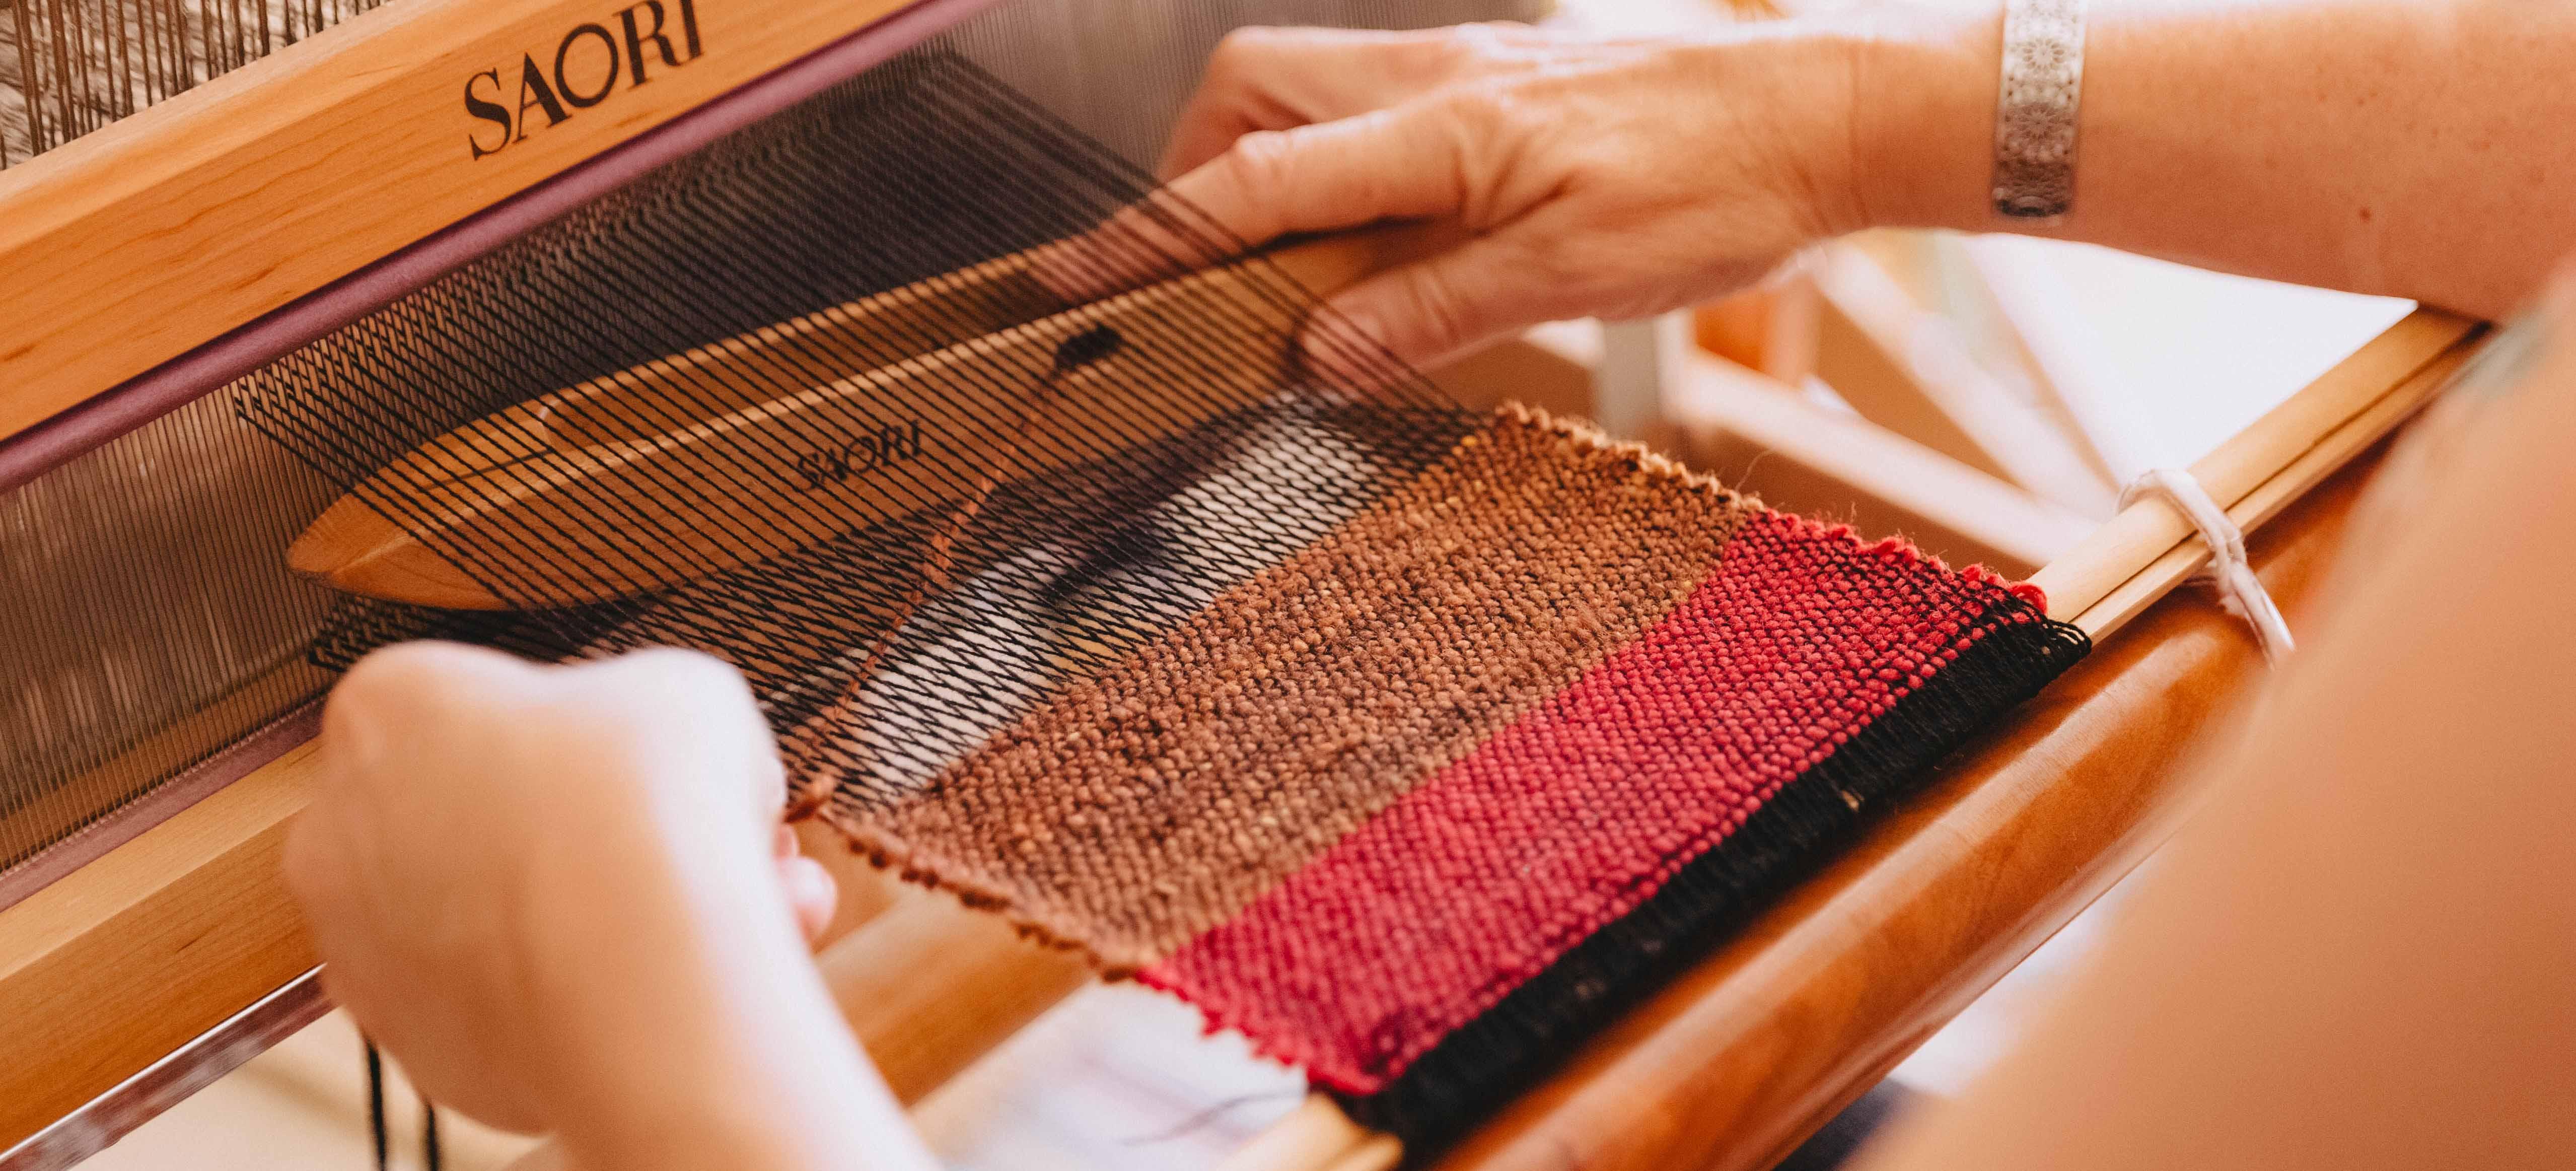 Take a weaving class using alpaca wool at Ashculme Textiles